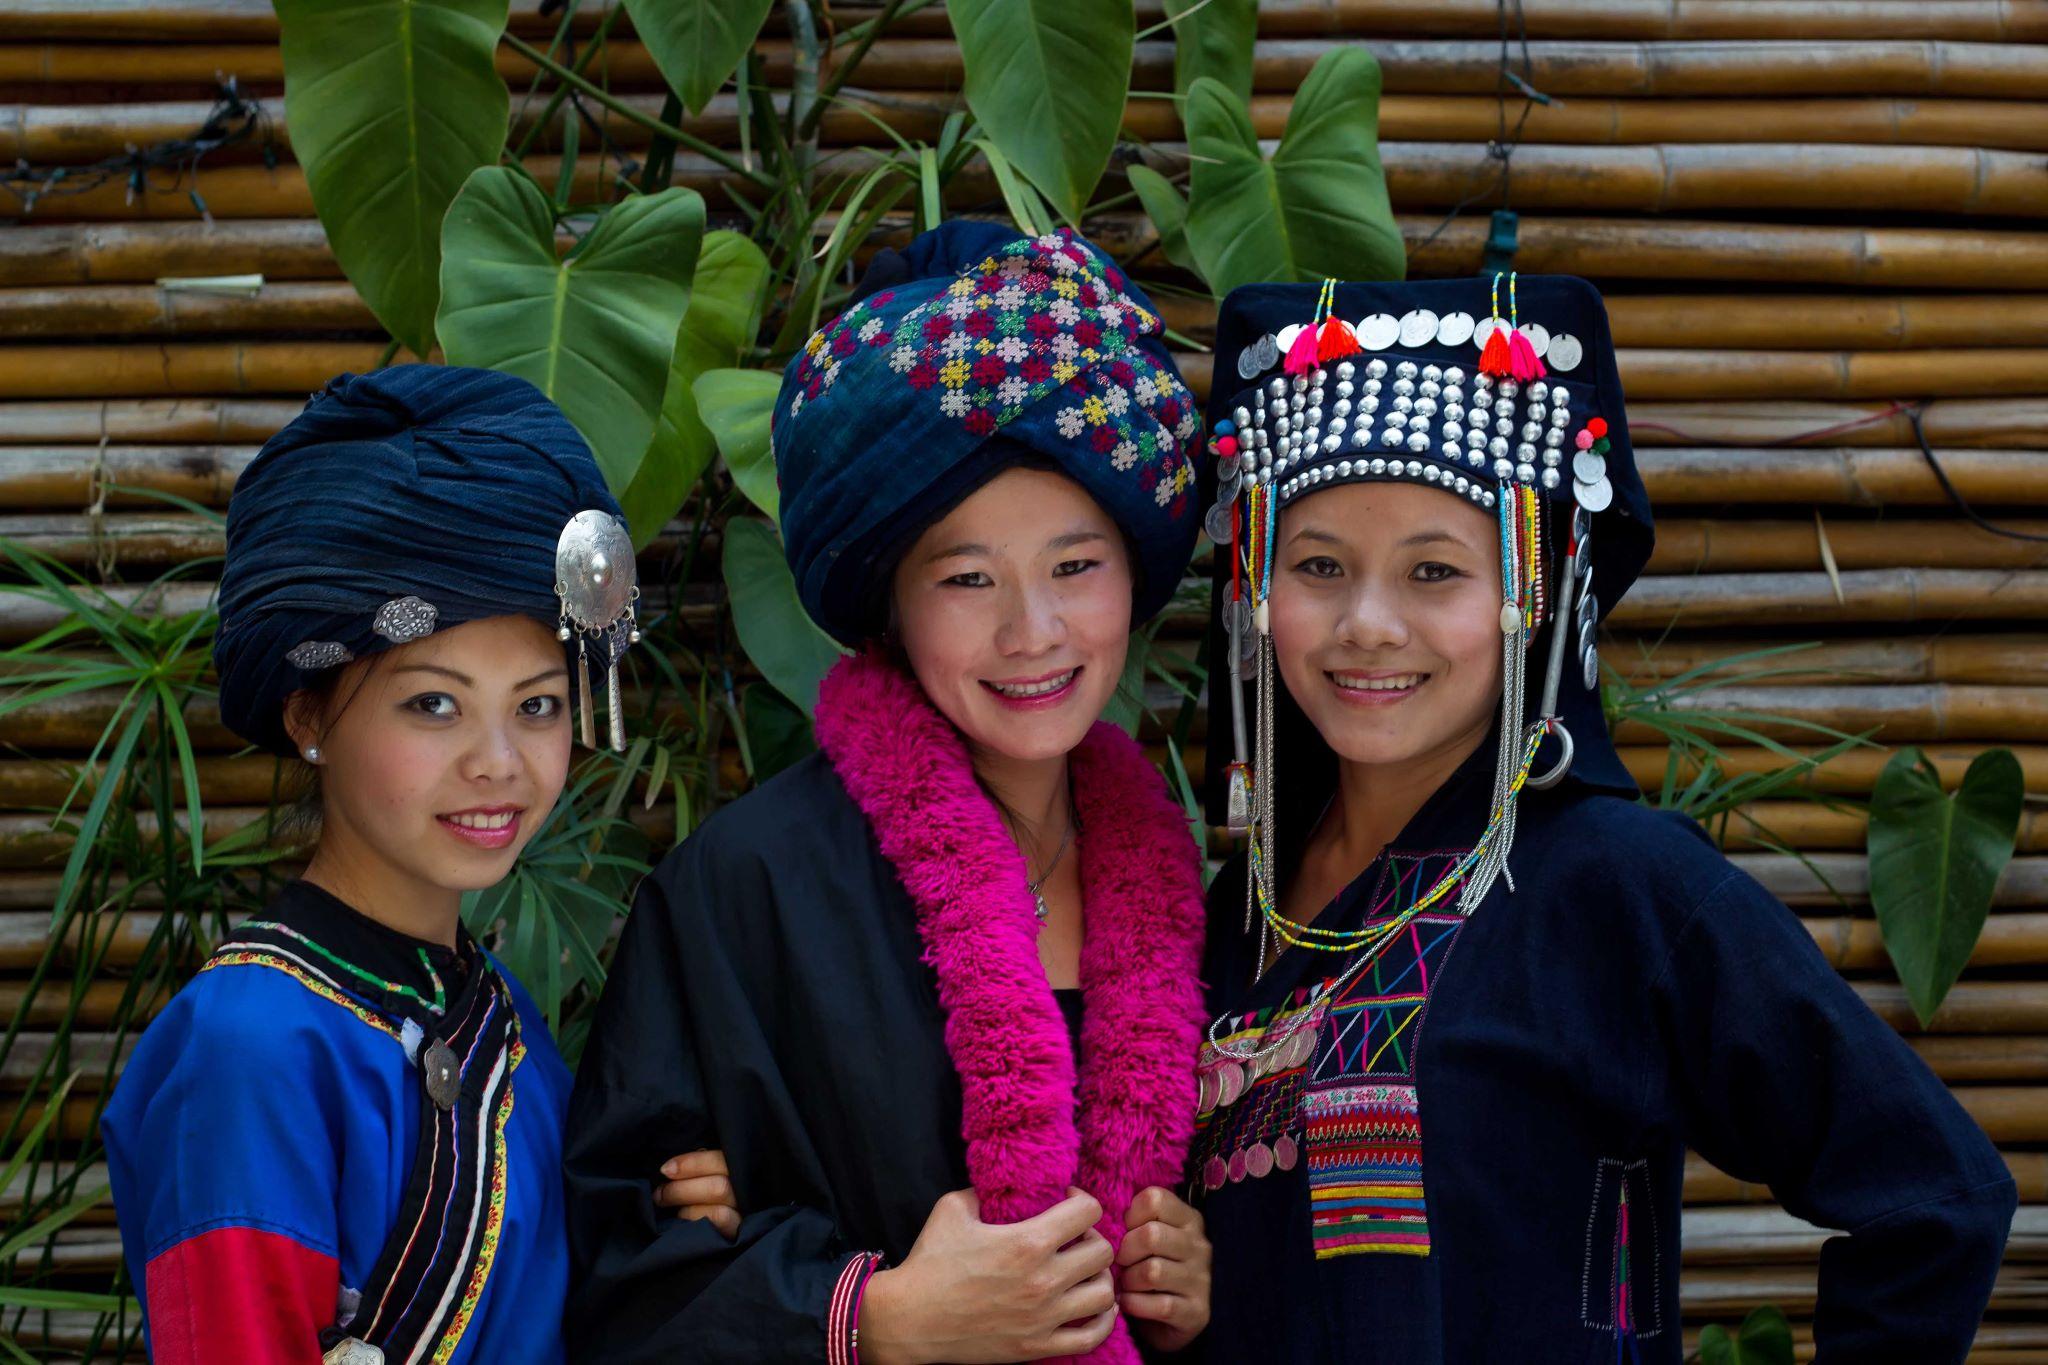 People of Laos | Explore Laos